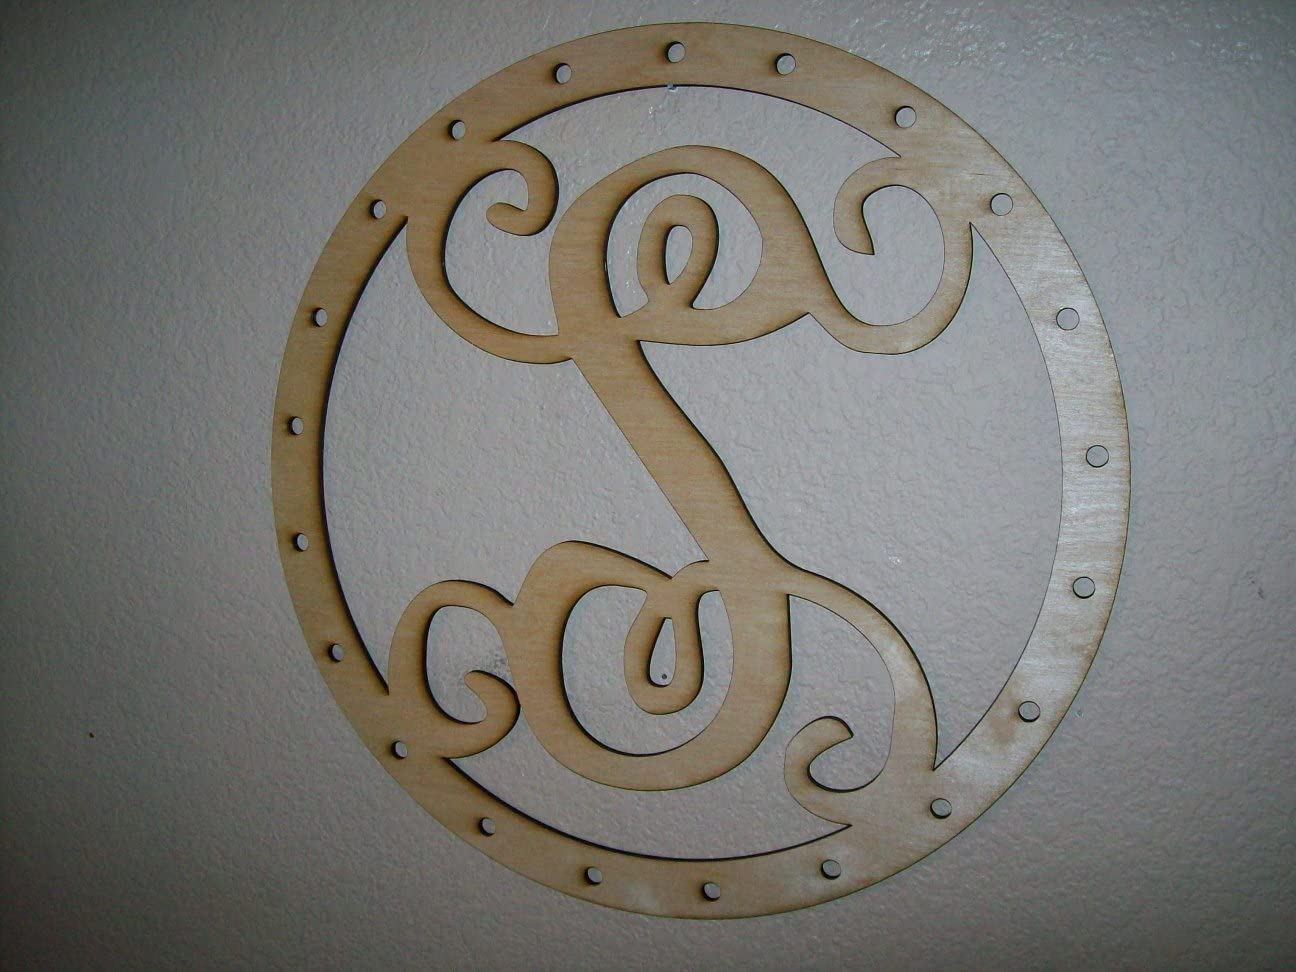 Unfinished Wood Circles Inside Frame Name Bar Vine Monogram 17.5 x 17.5 inch